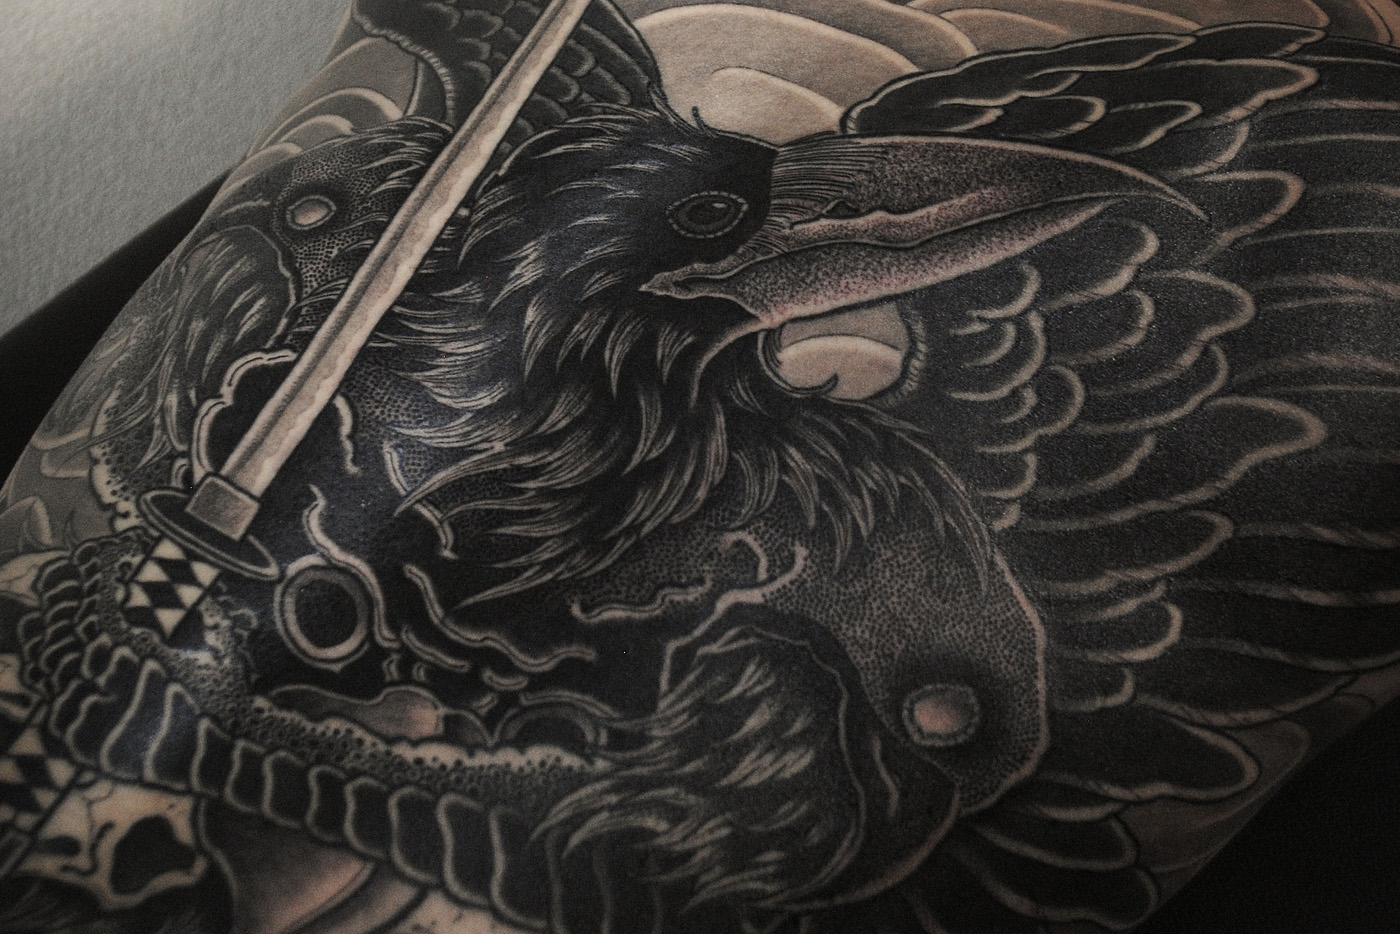 Oeuvre du tatoueur japonais Gakkin. (photo Gakkin)